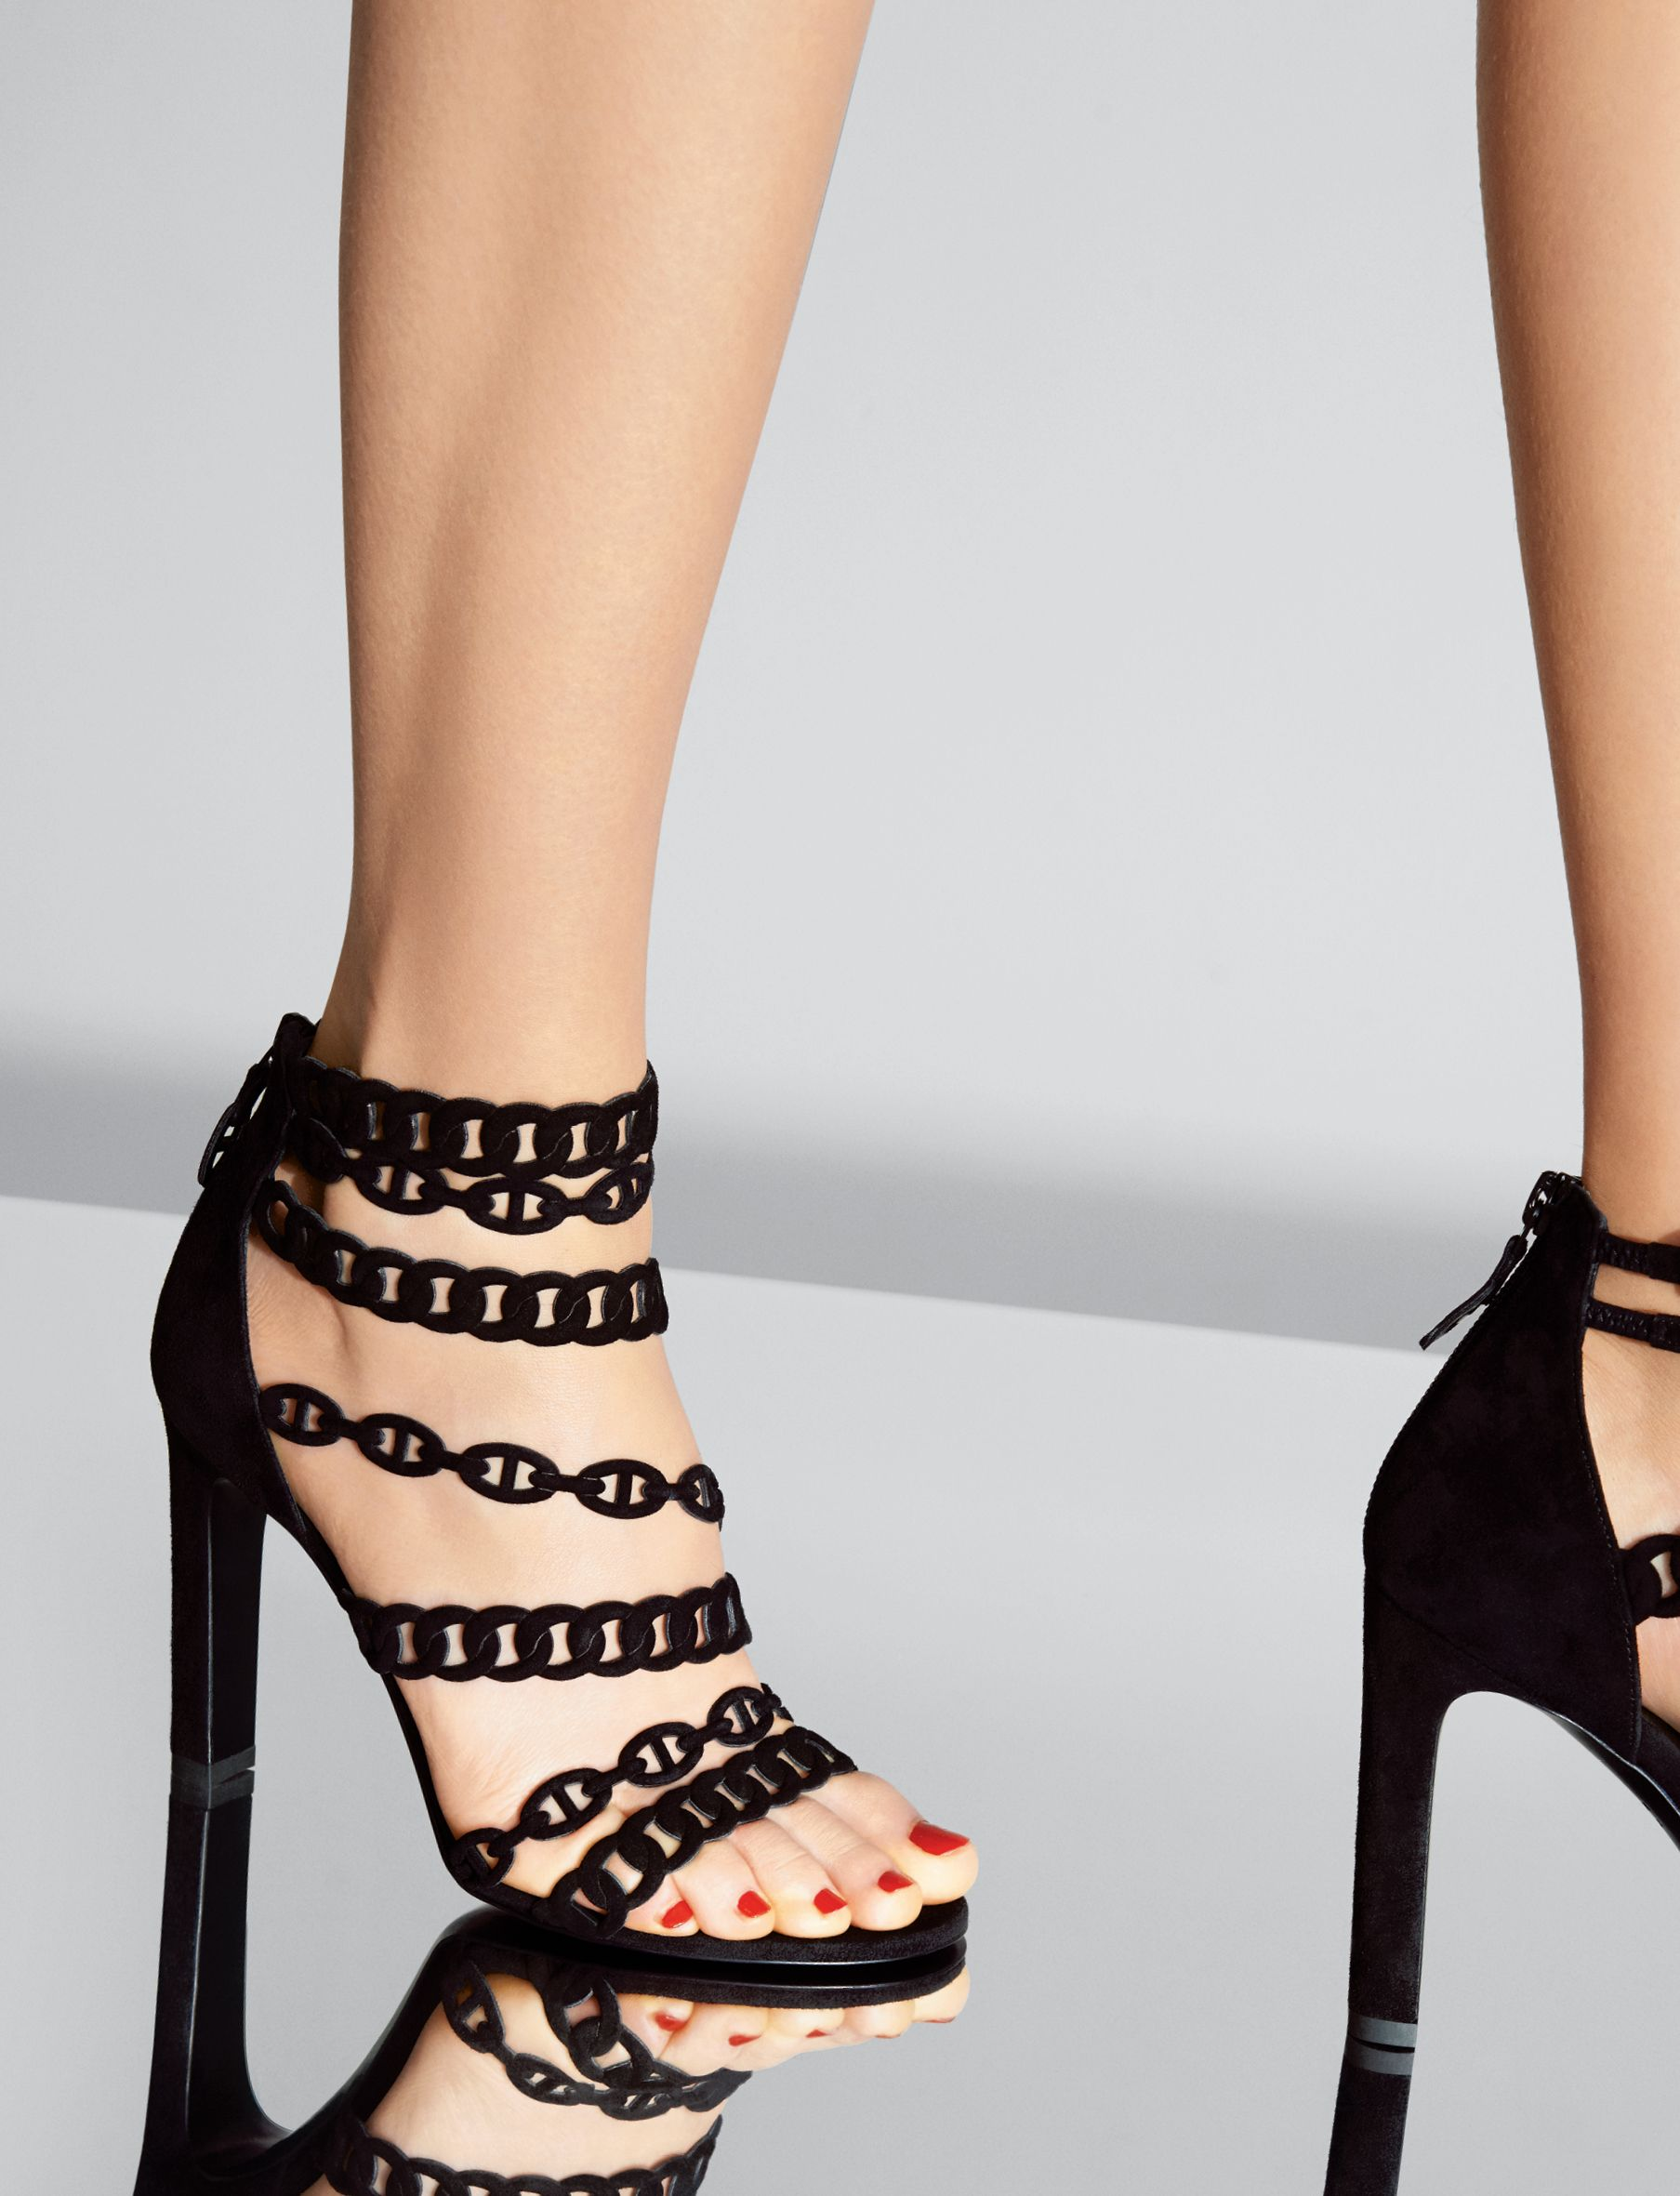 Hermes sandals dance shoes - Sandal In Black Suede Goatskin With Cha Ne D Ancre Design Hermes Shoes